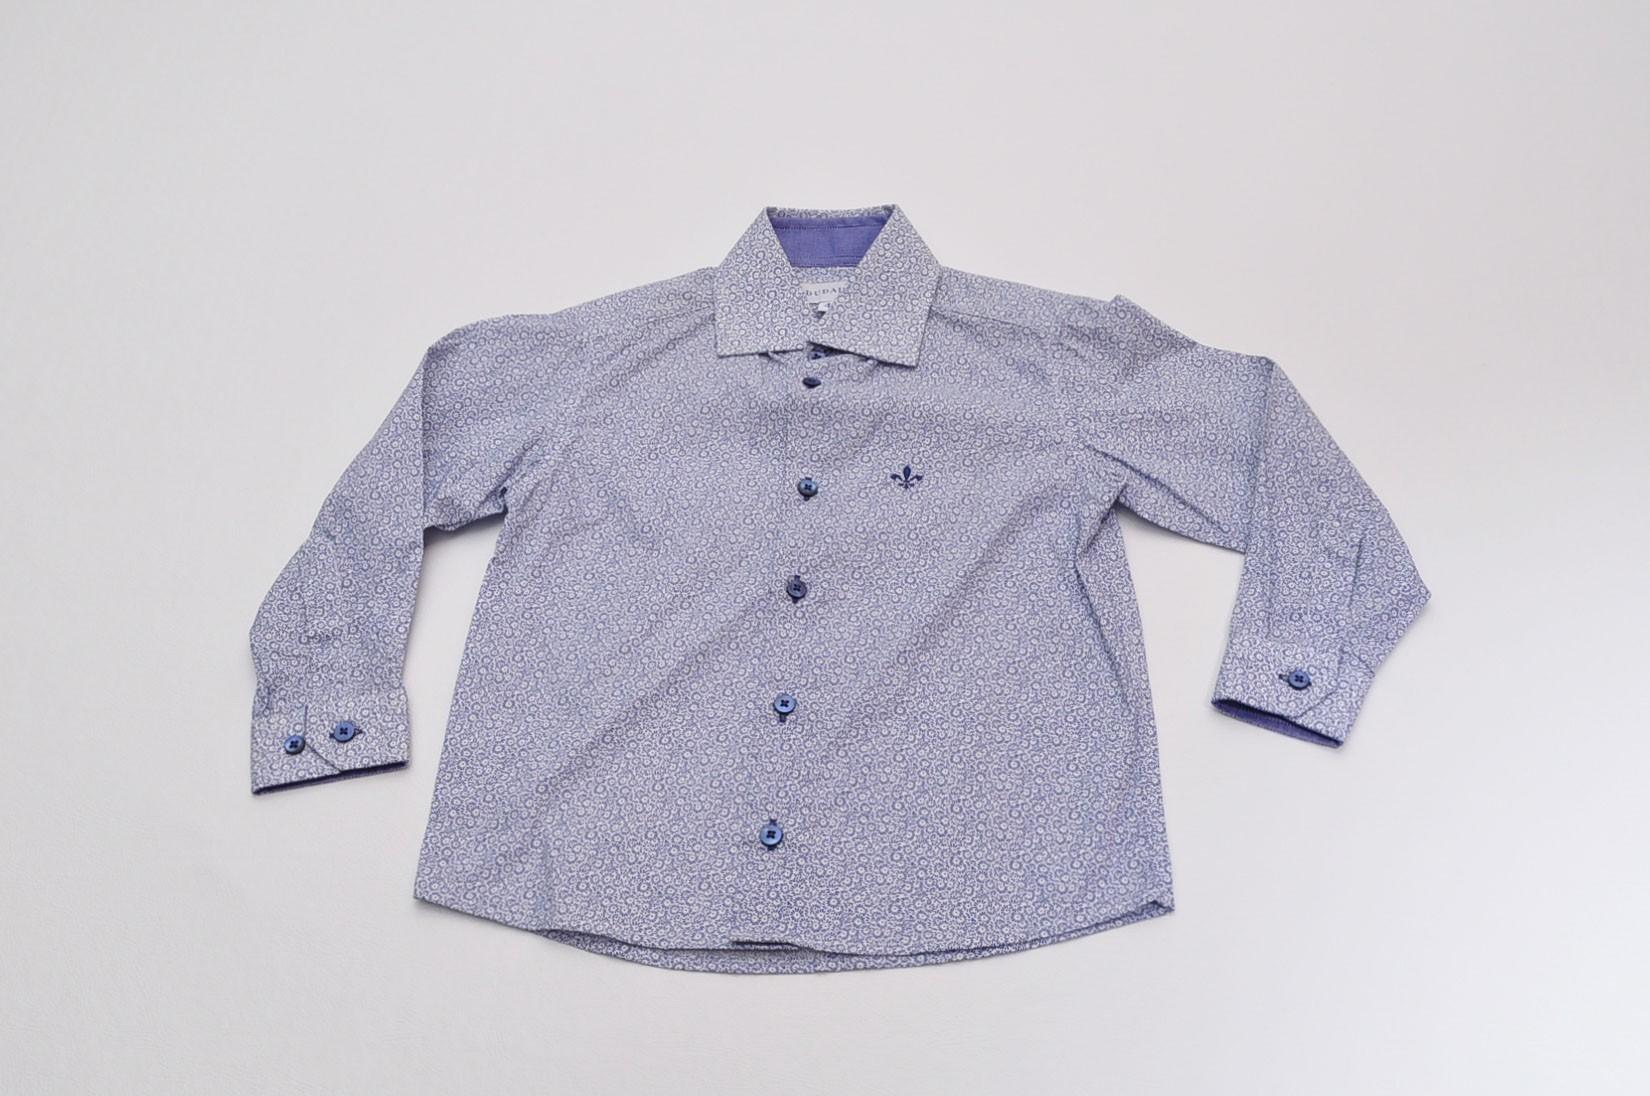 Camisa Dudalina- Tam 04 anos